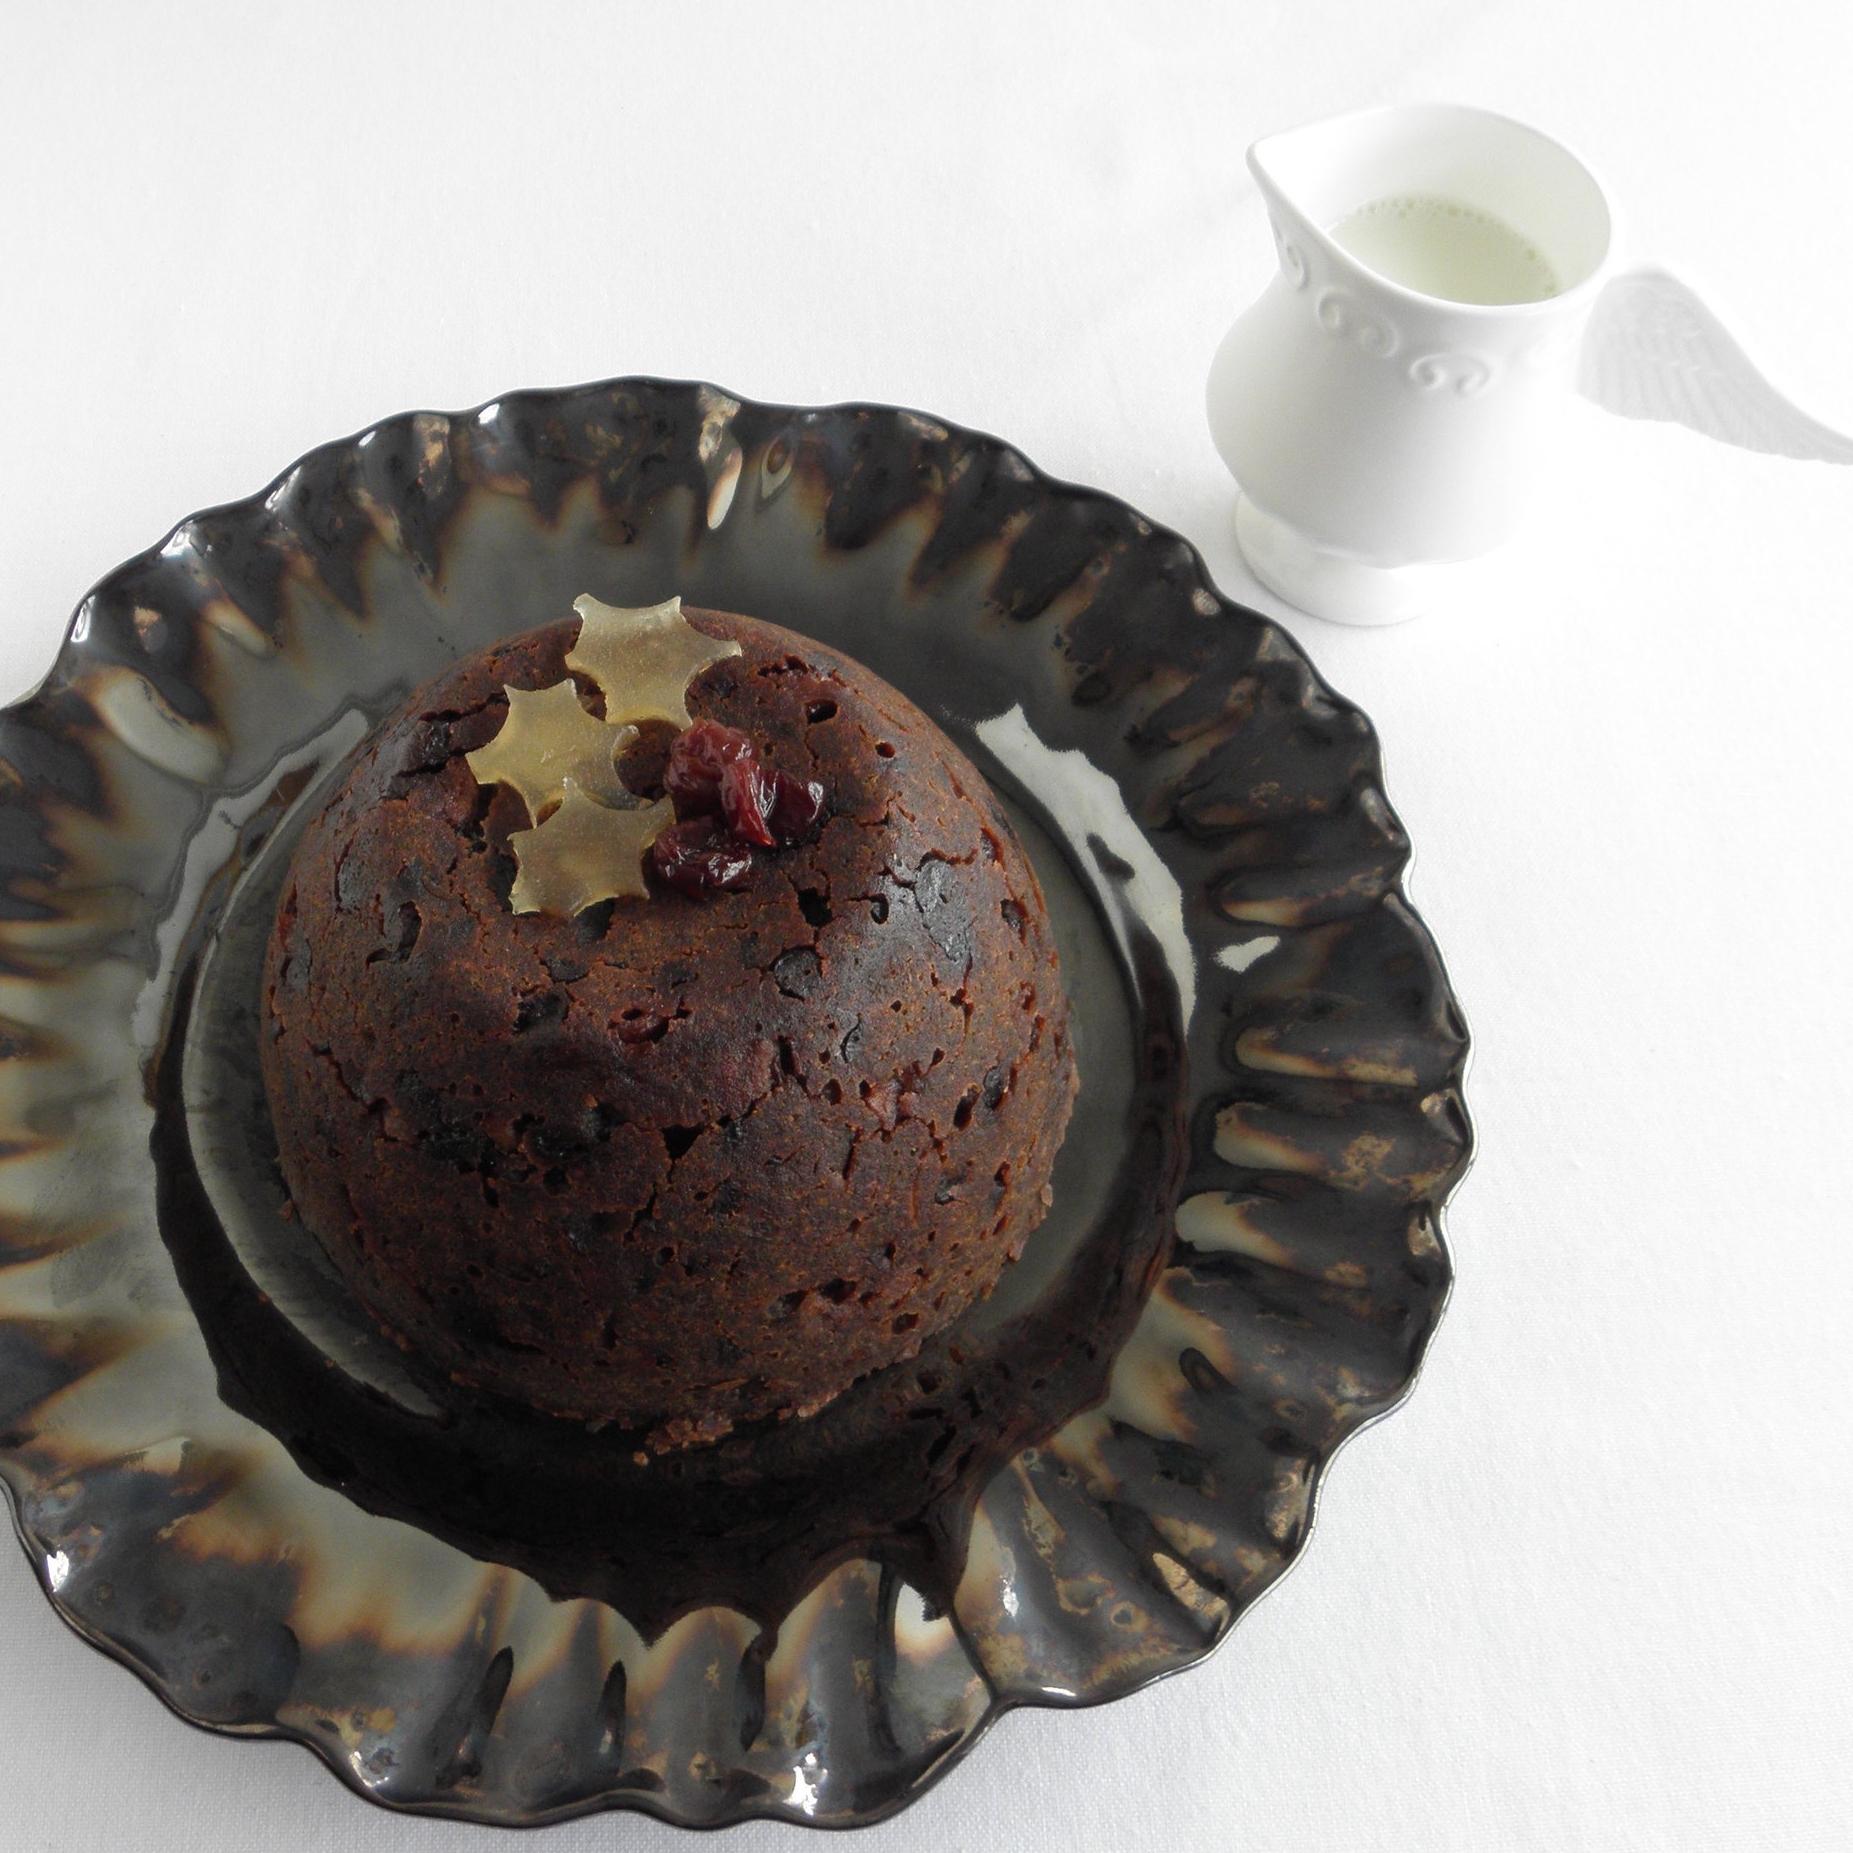 Rhubarb and Armagnac plum pudding